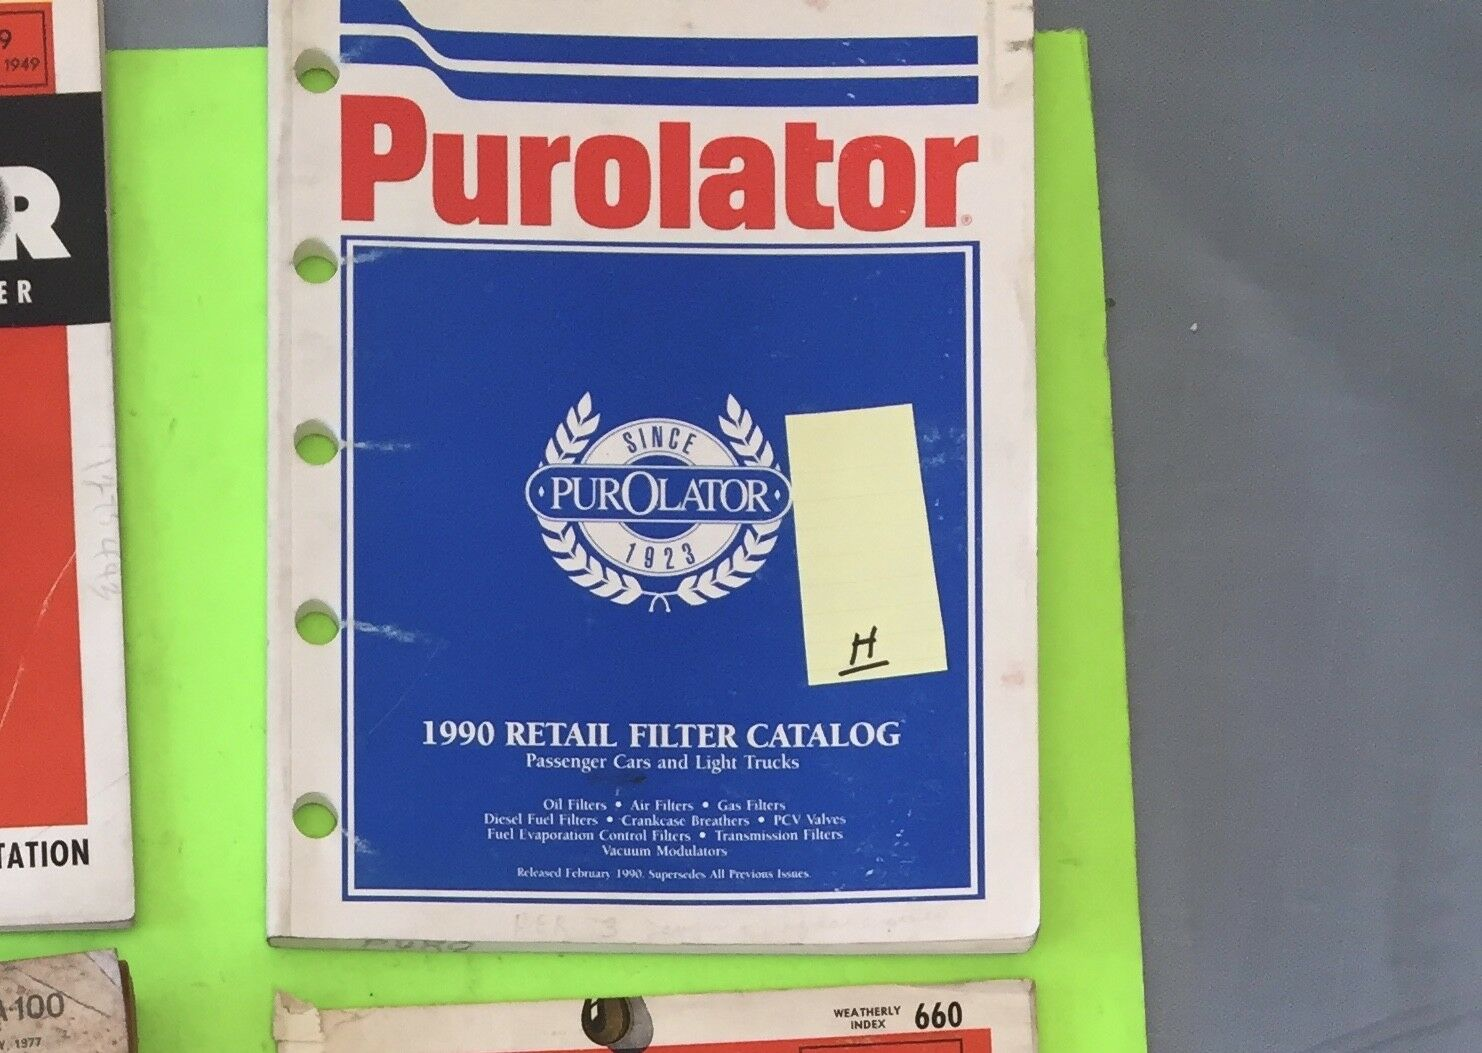 Purolator retail filter catalog.  1990.     Item:  9215h